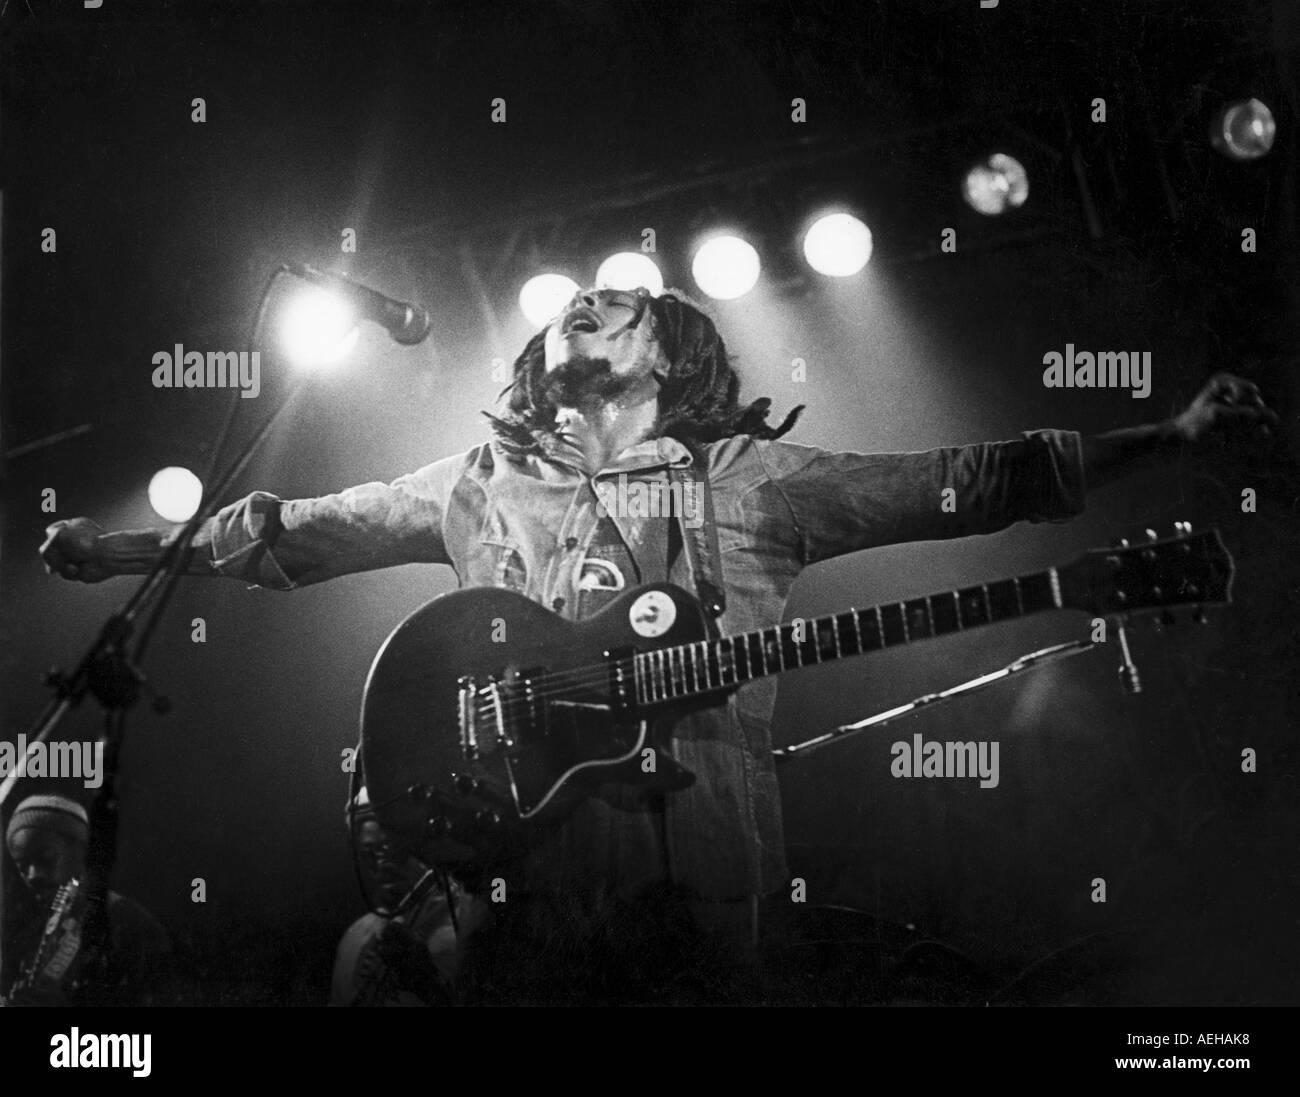 BOB MARLEY Jamaican reggae musician in 1976 - Stock Image